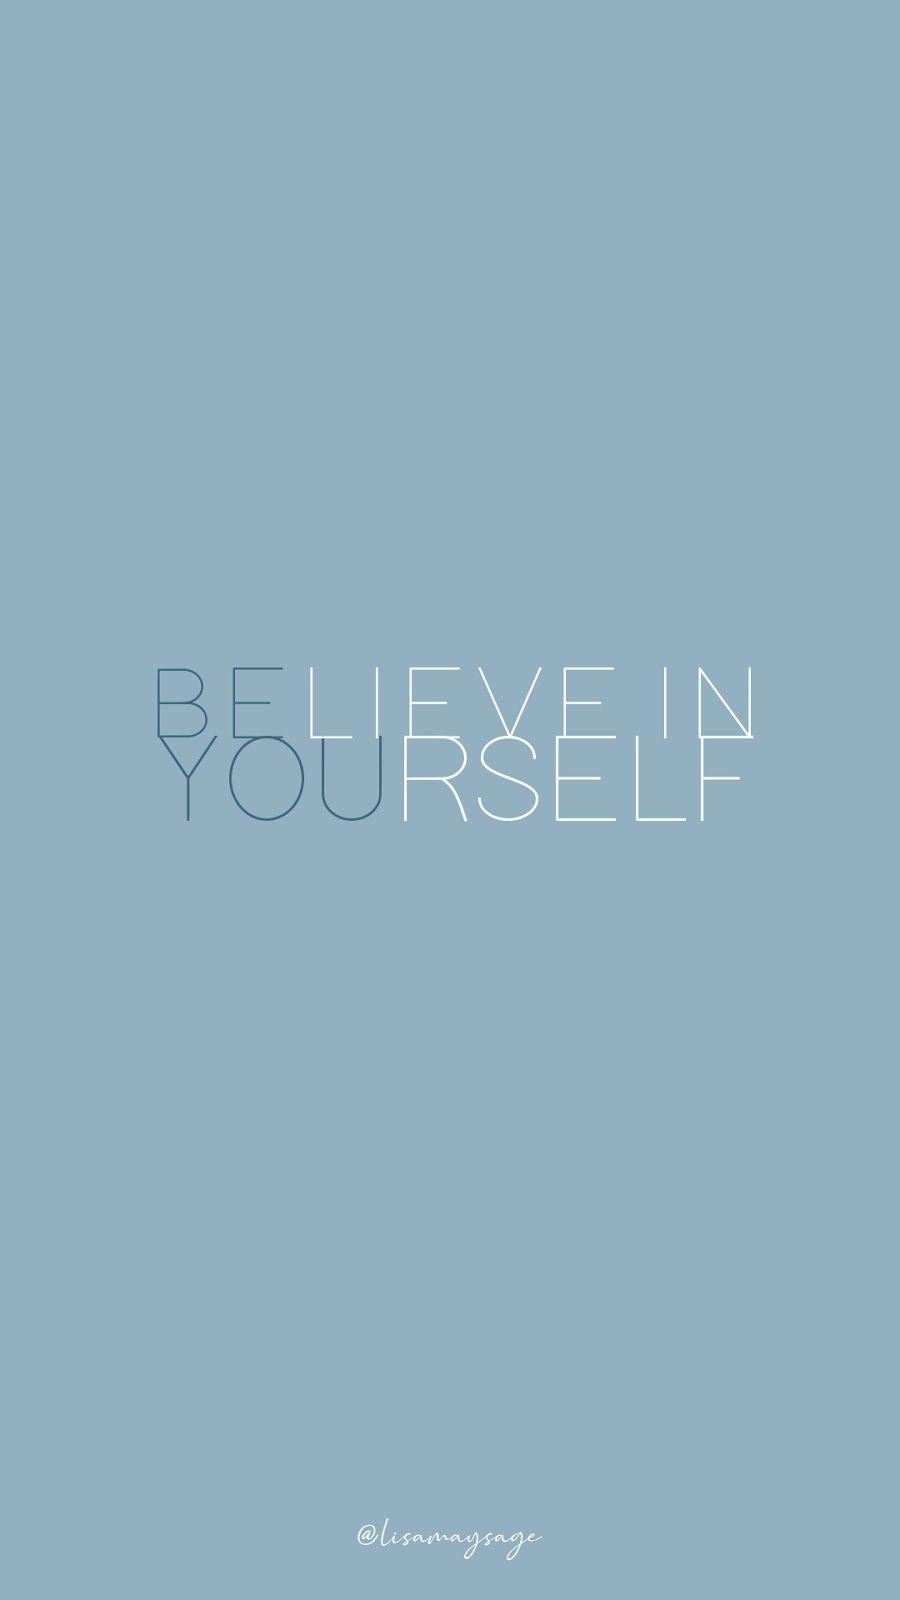 Inspirational Girl Boss Quote Inspirational Quotes Wallpapers Wallpaper Quotes Positive Wallpapers